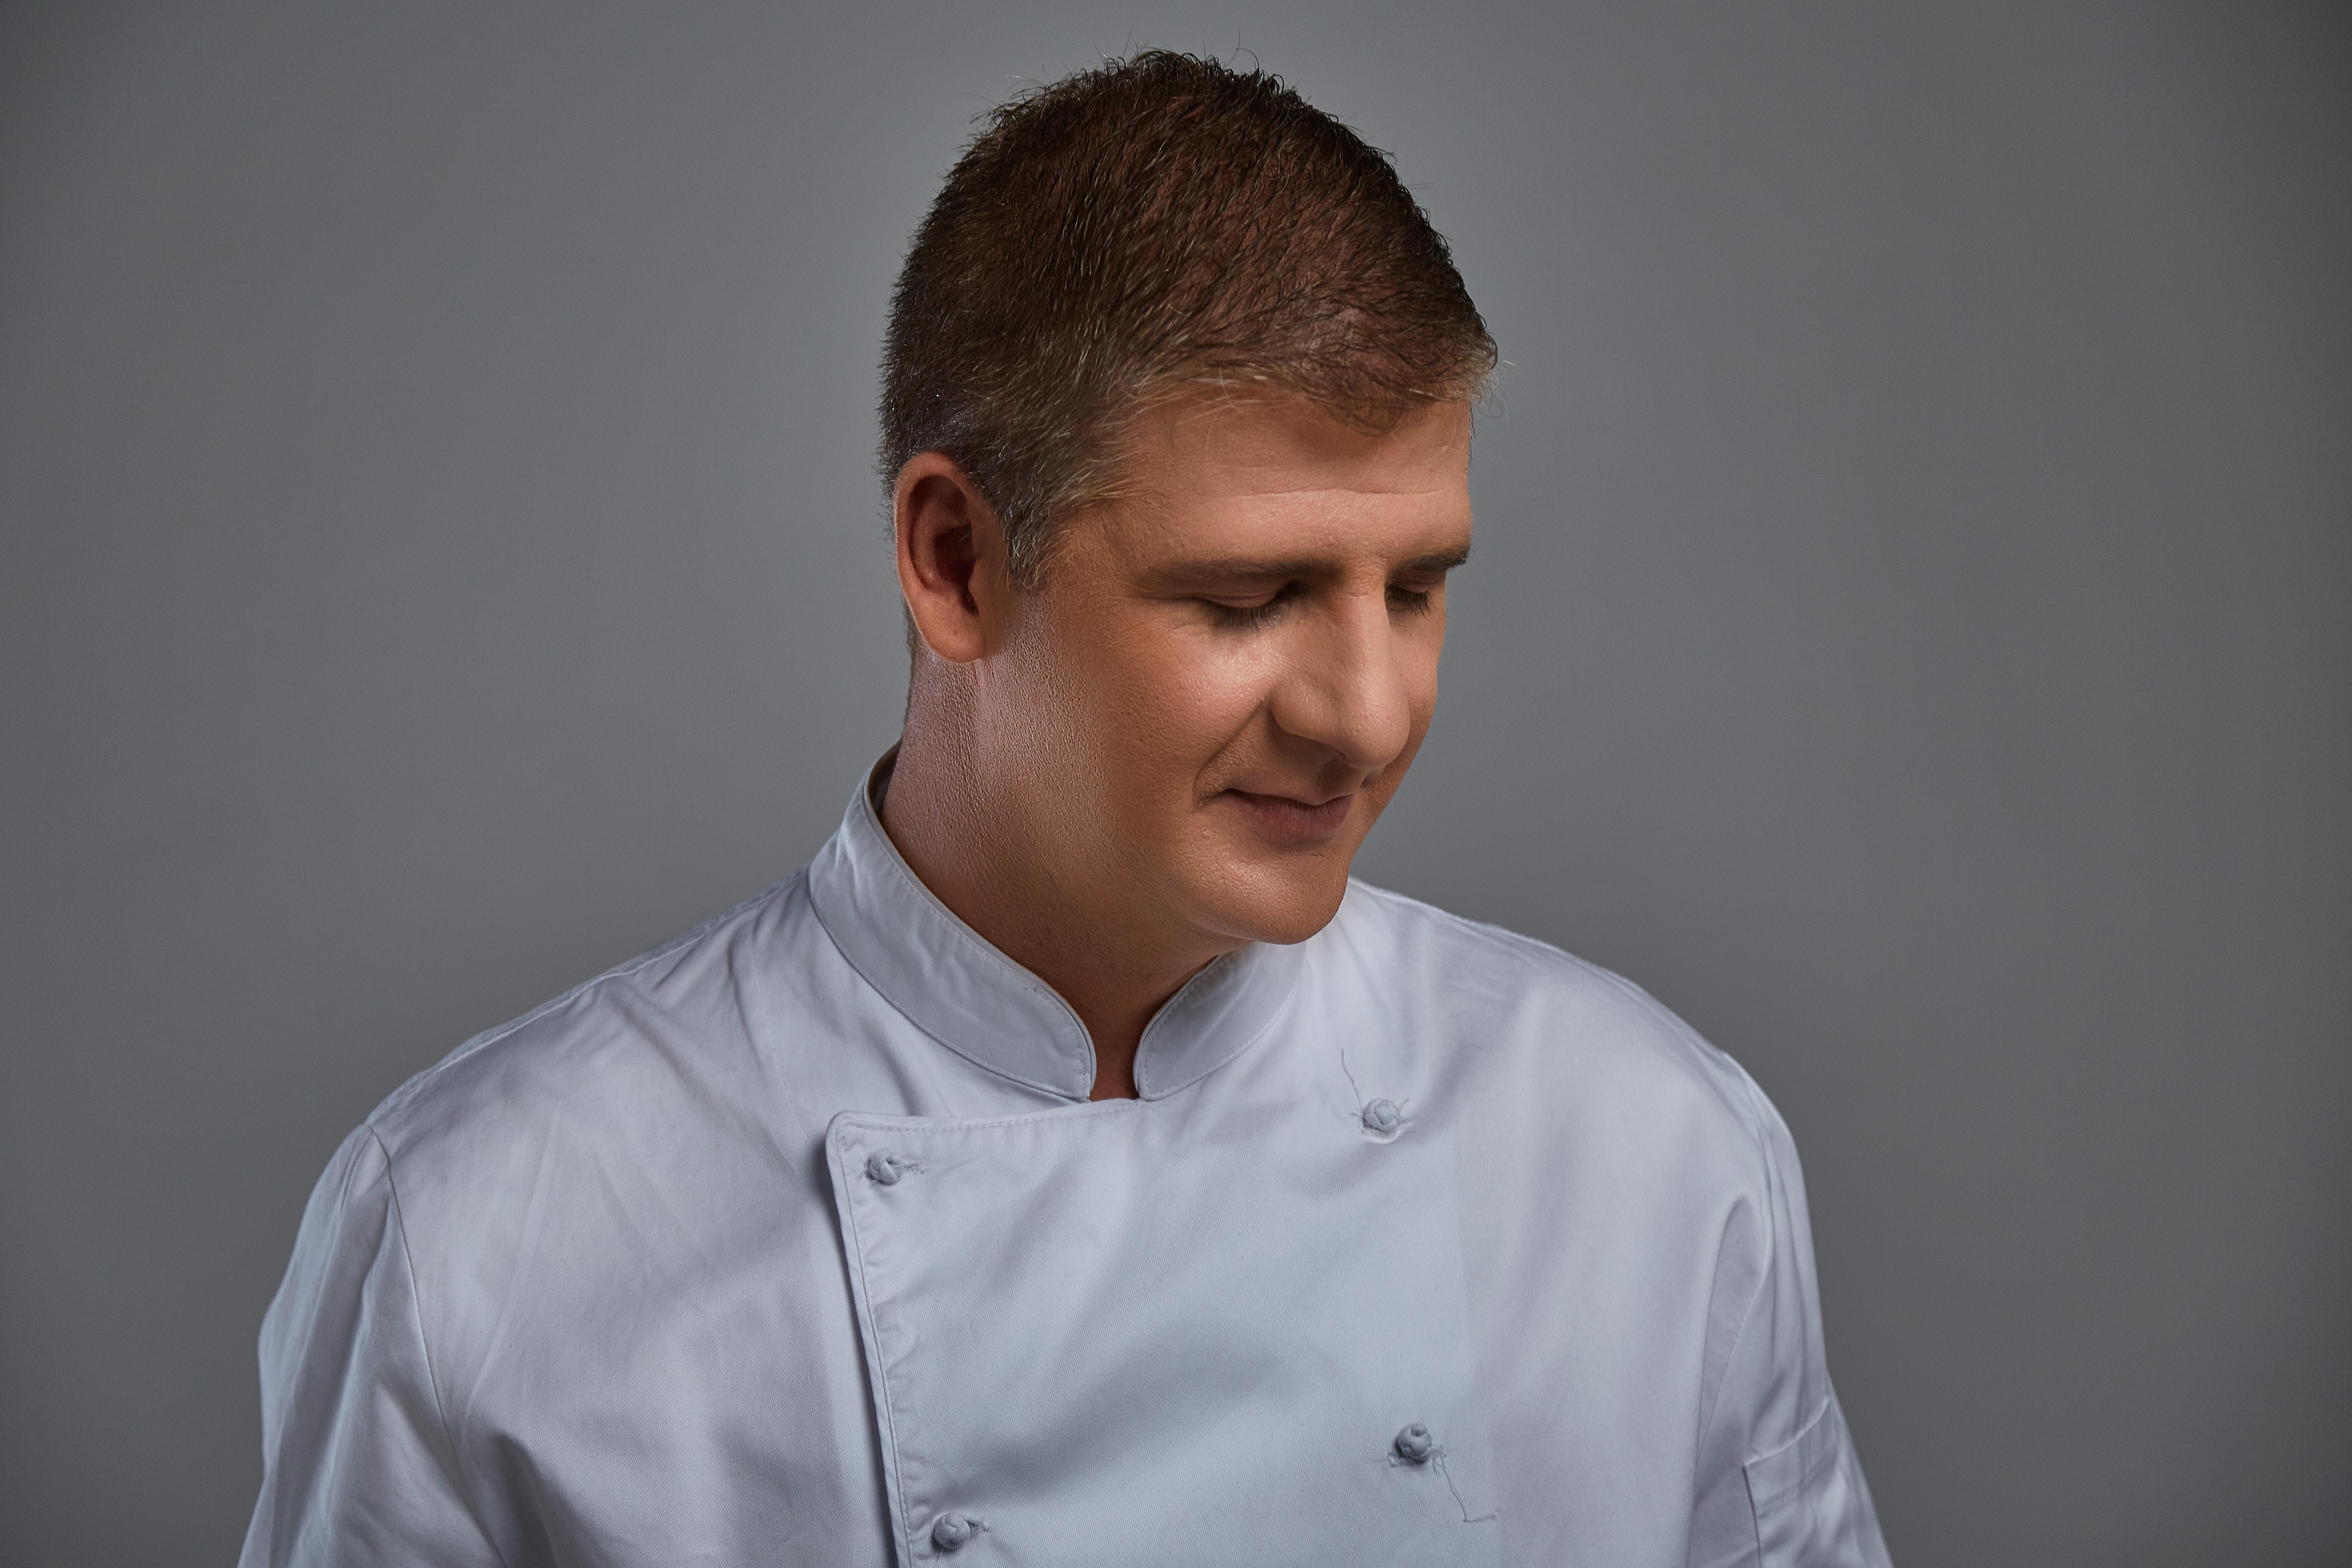 Lust Bistro: The Chefs